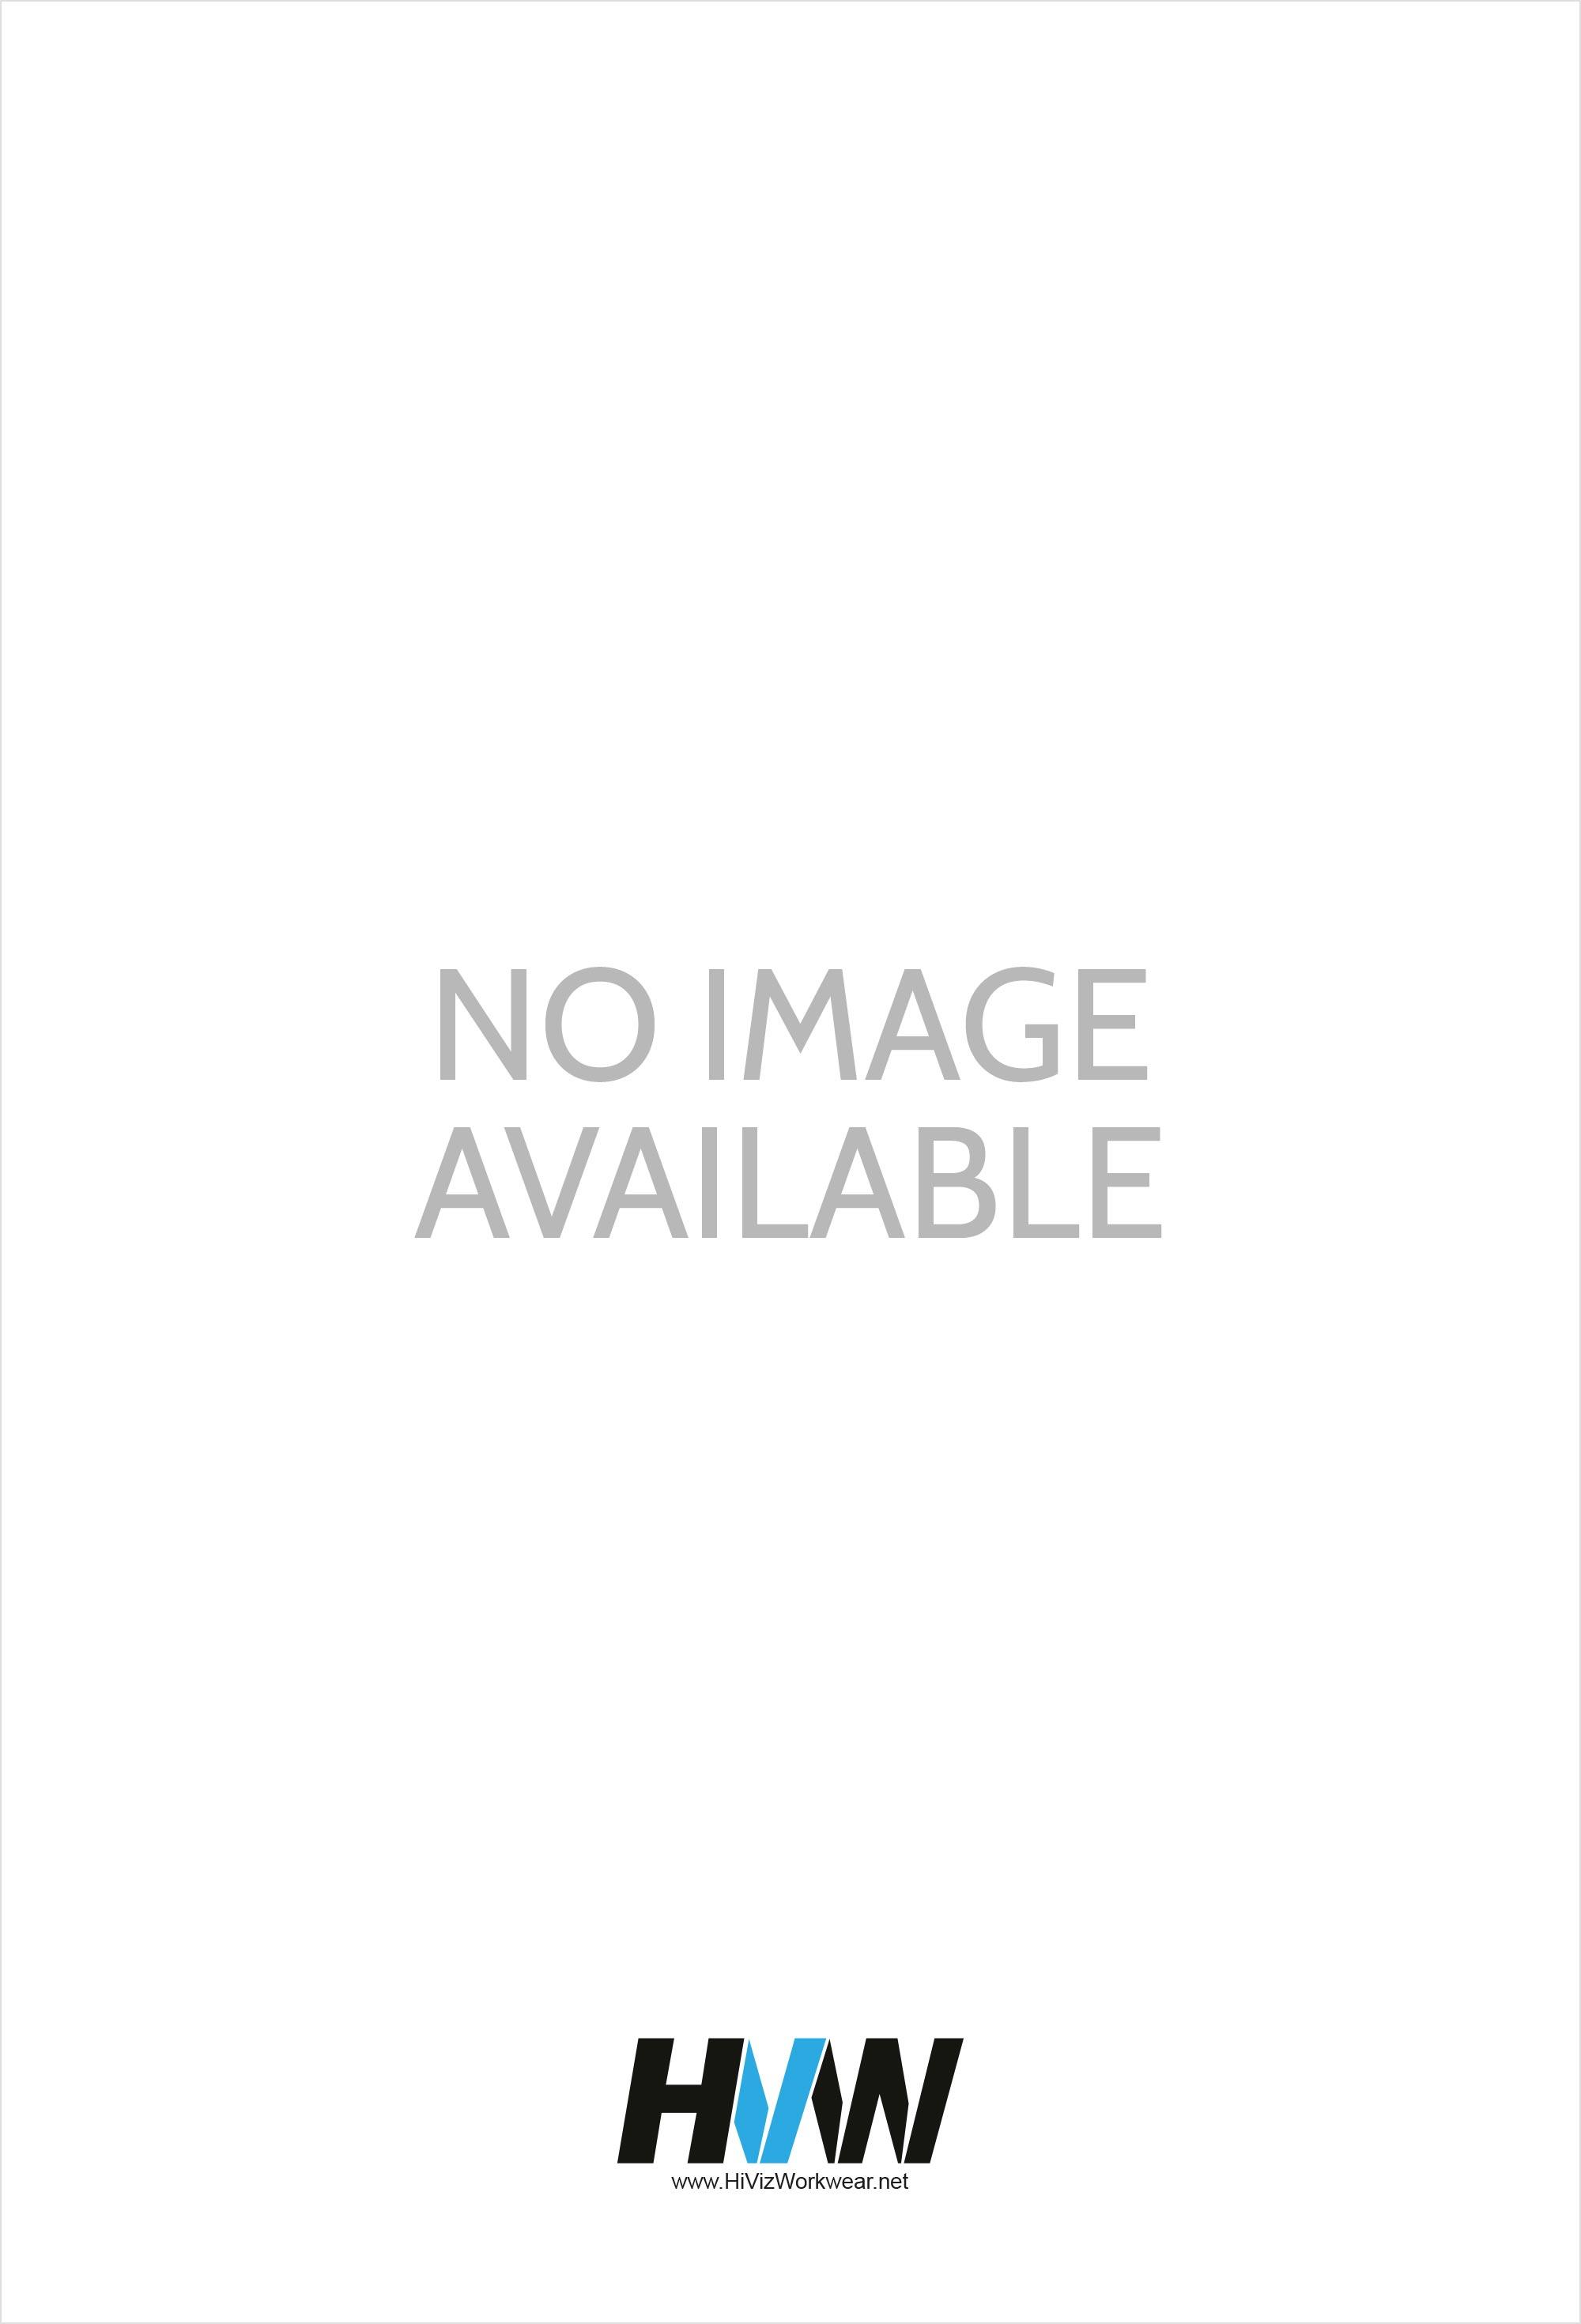 Premier PR212 Short Sleeve Pilot Shirt  (Collar Size 14.5 To 19.0)